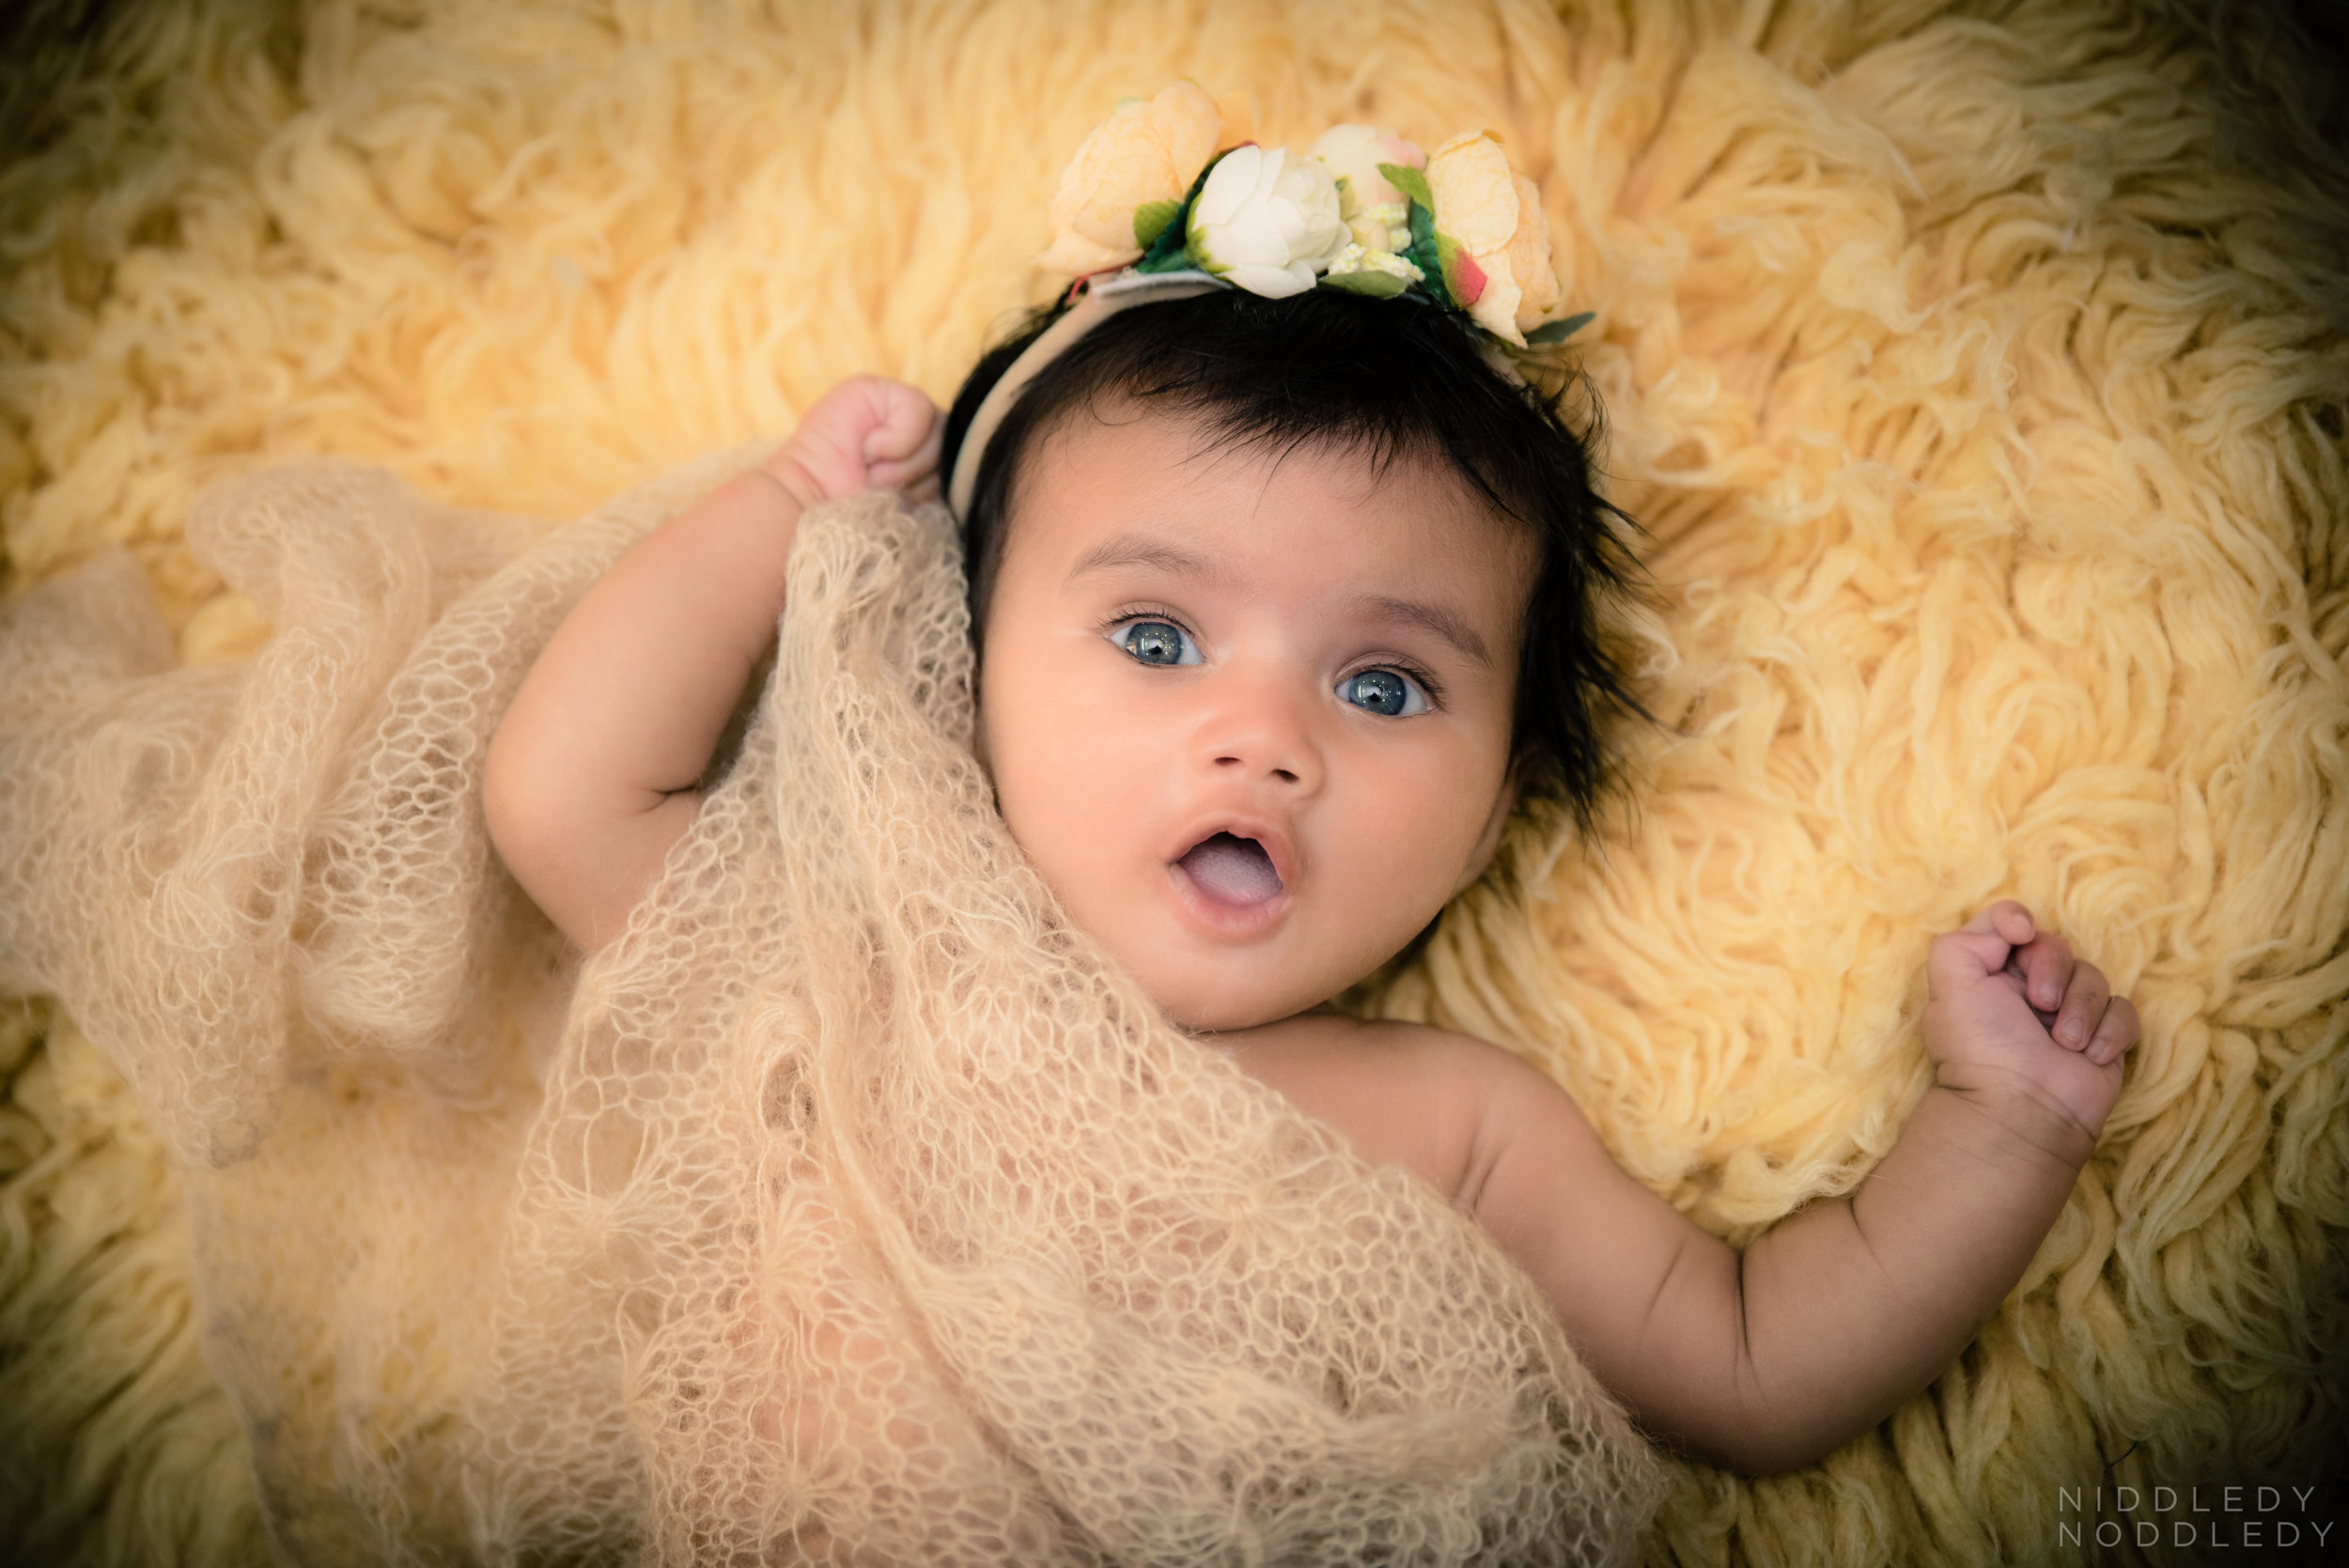 Rishika Newborn Photoshoot ❤ NiddledyNoddledy.com ~ Bumps to Babies Photography, Kolkata - 02.jpg